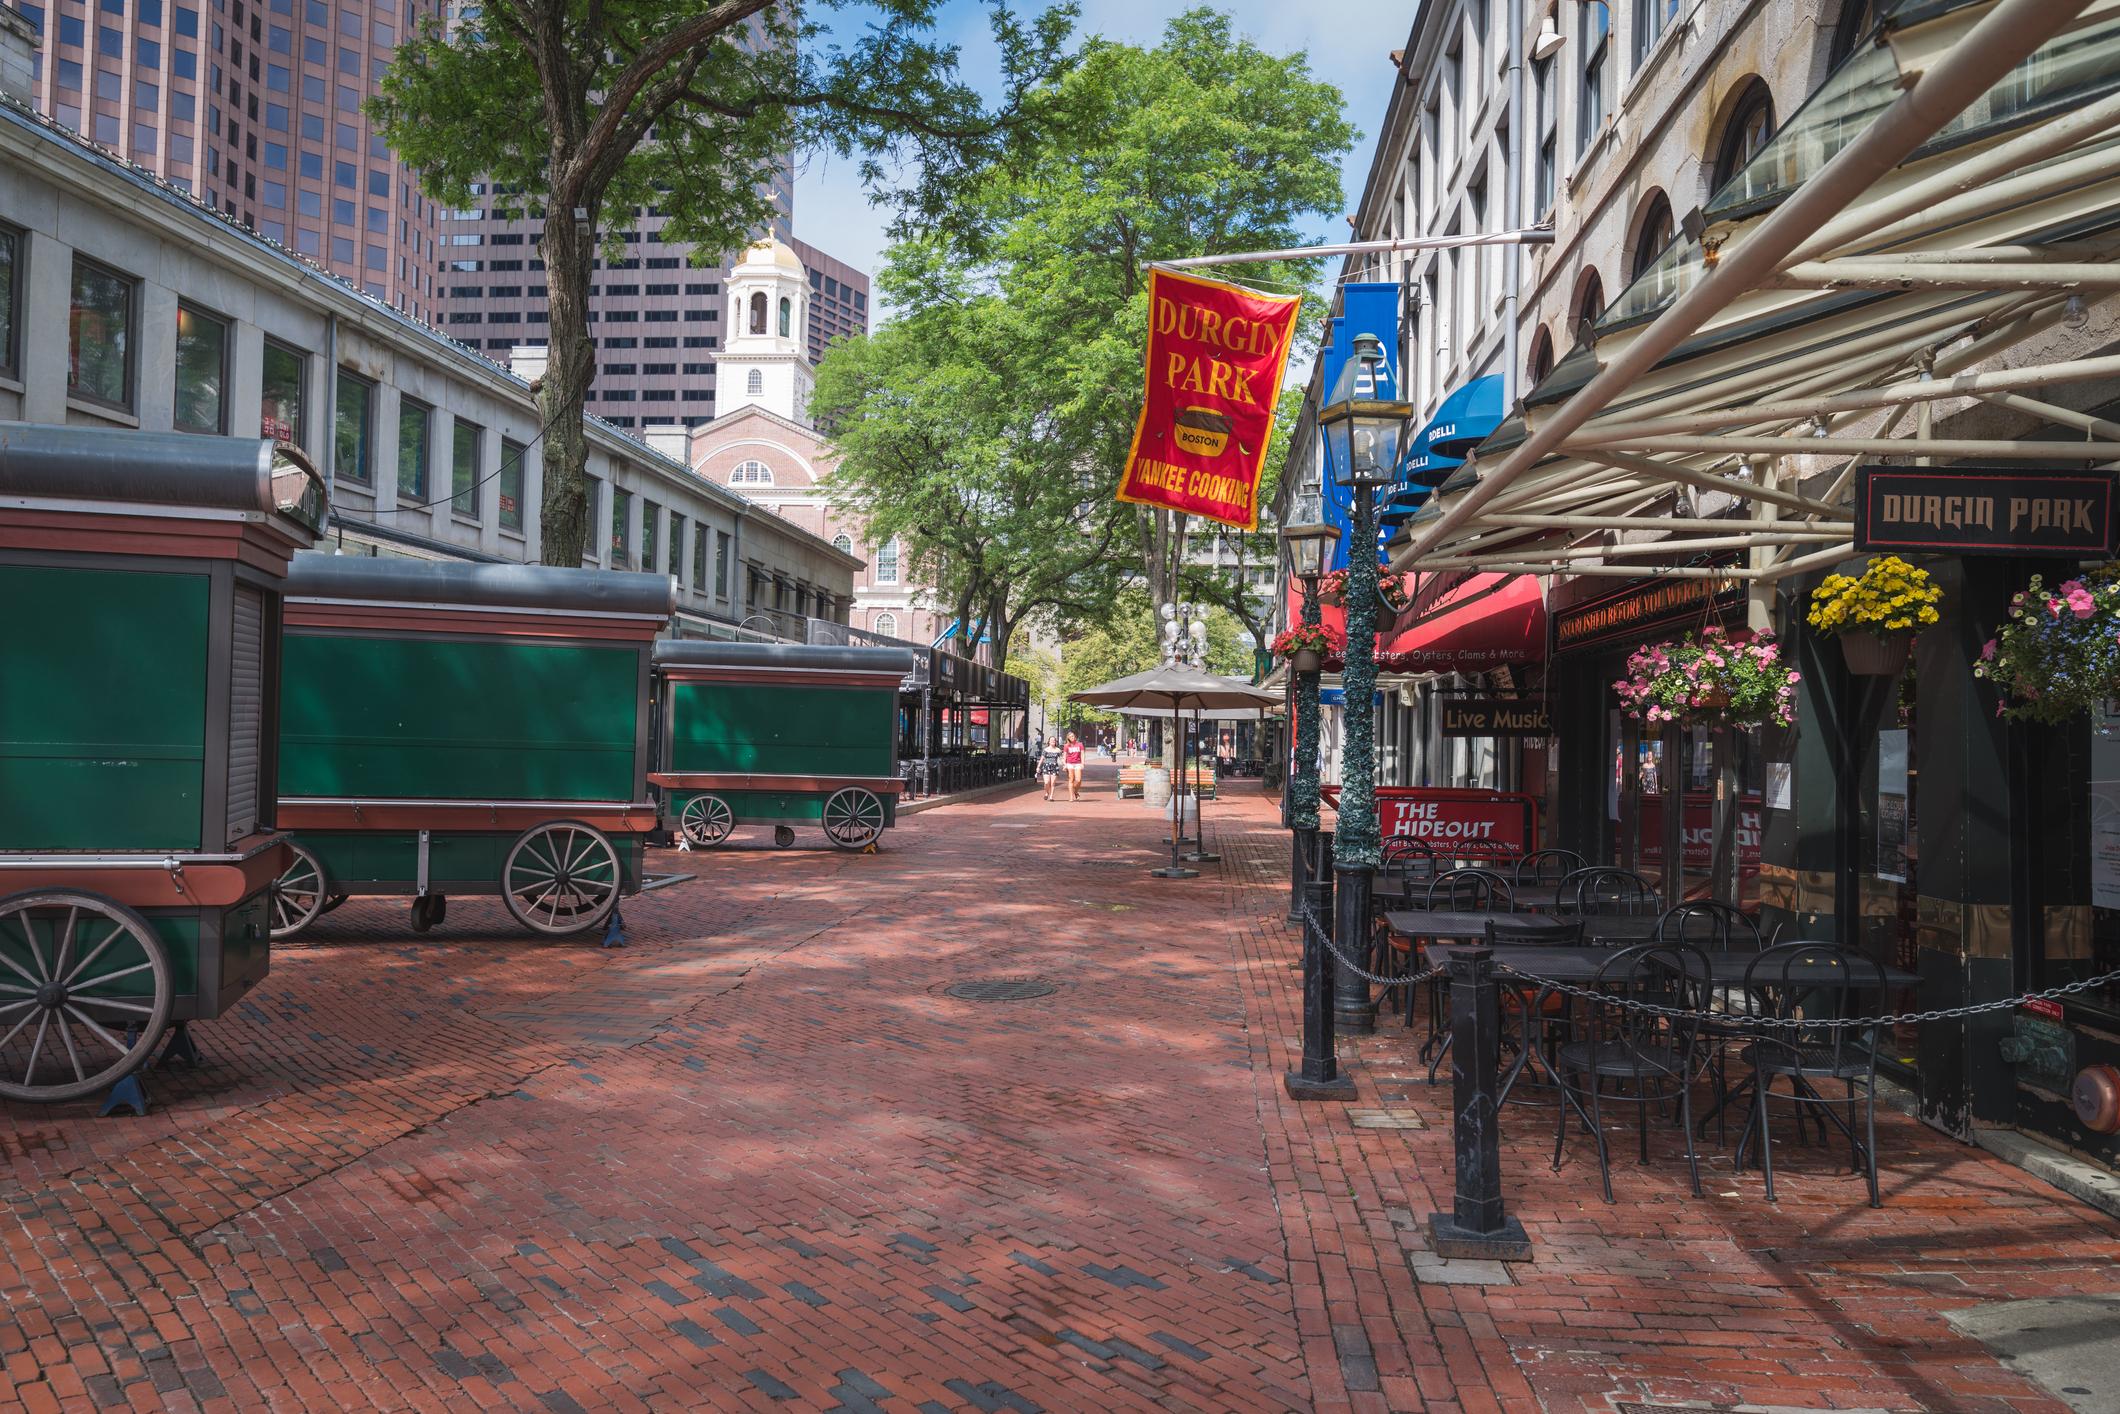 Boston, United States - June 18th, 2017: Street scene along the Freedom Trail in Boston, MA